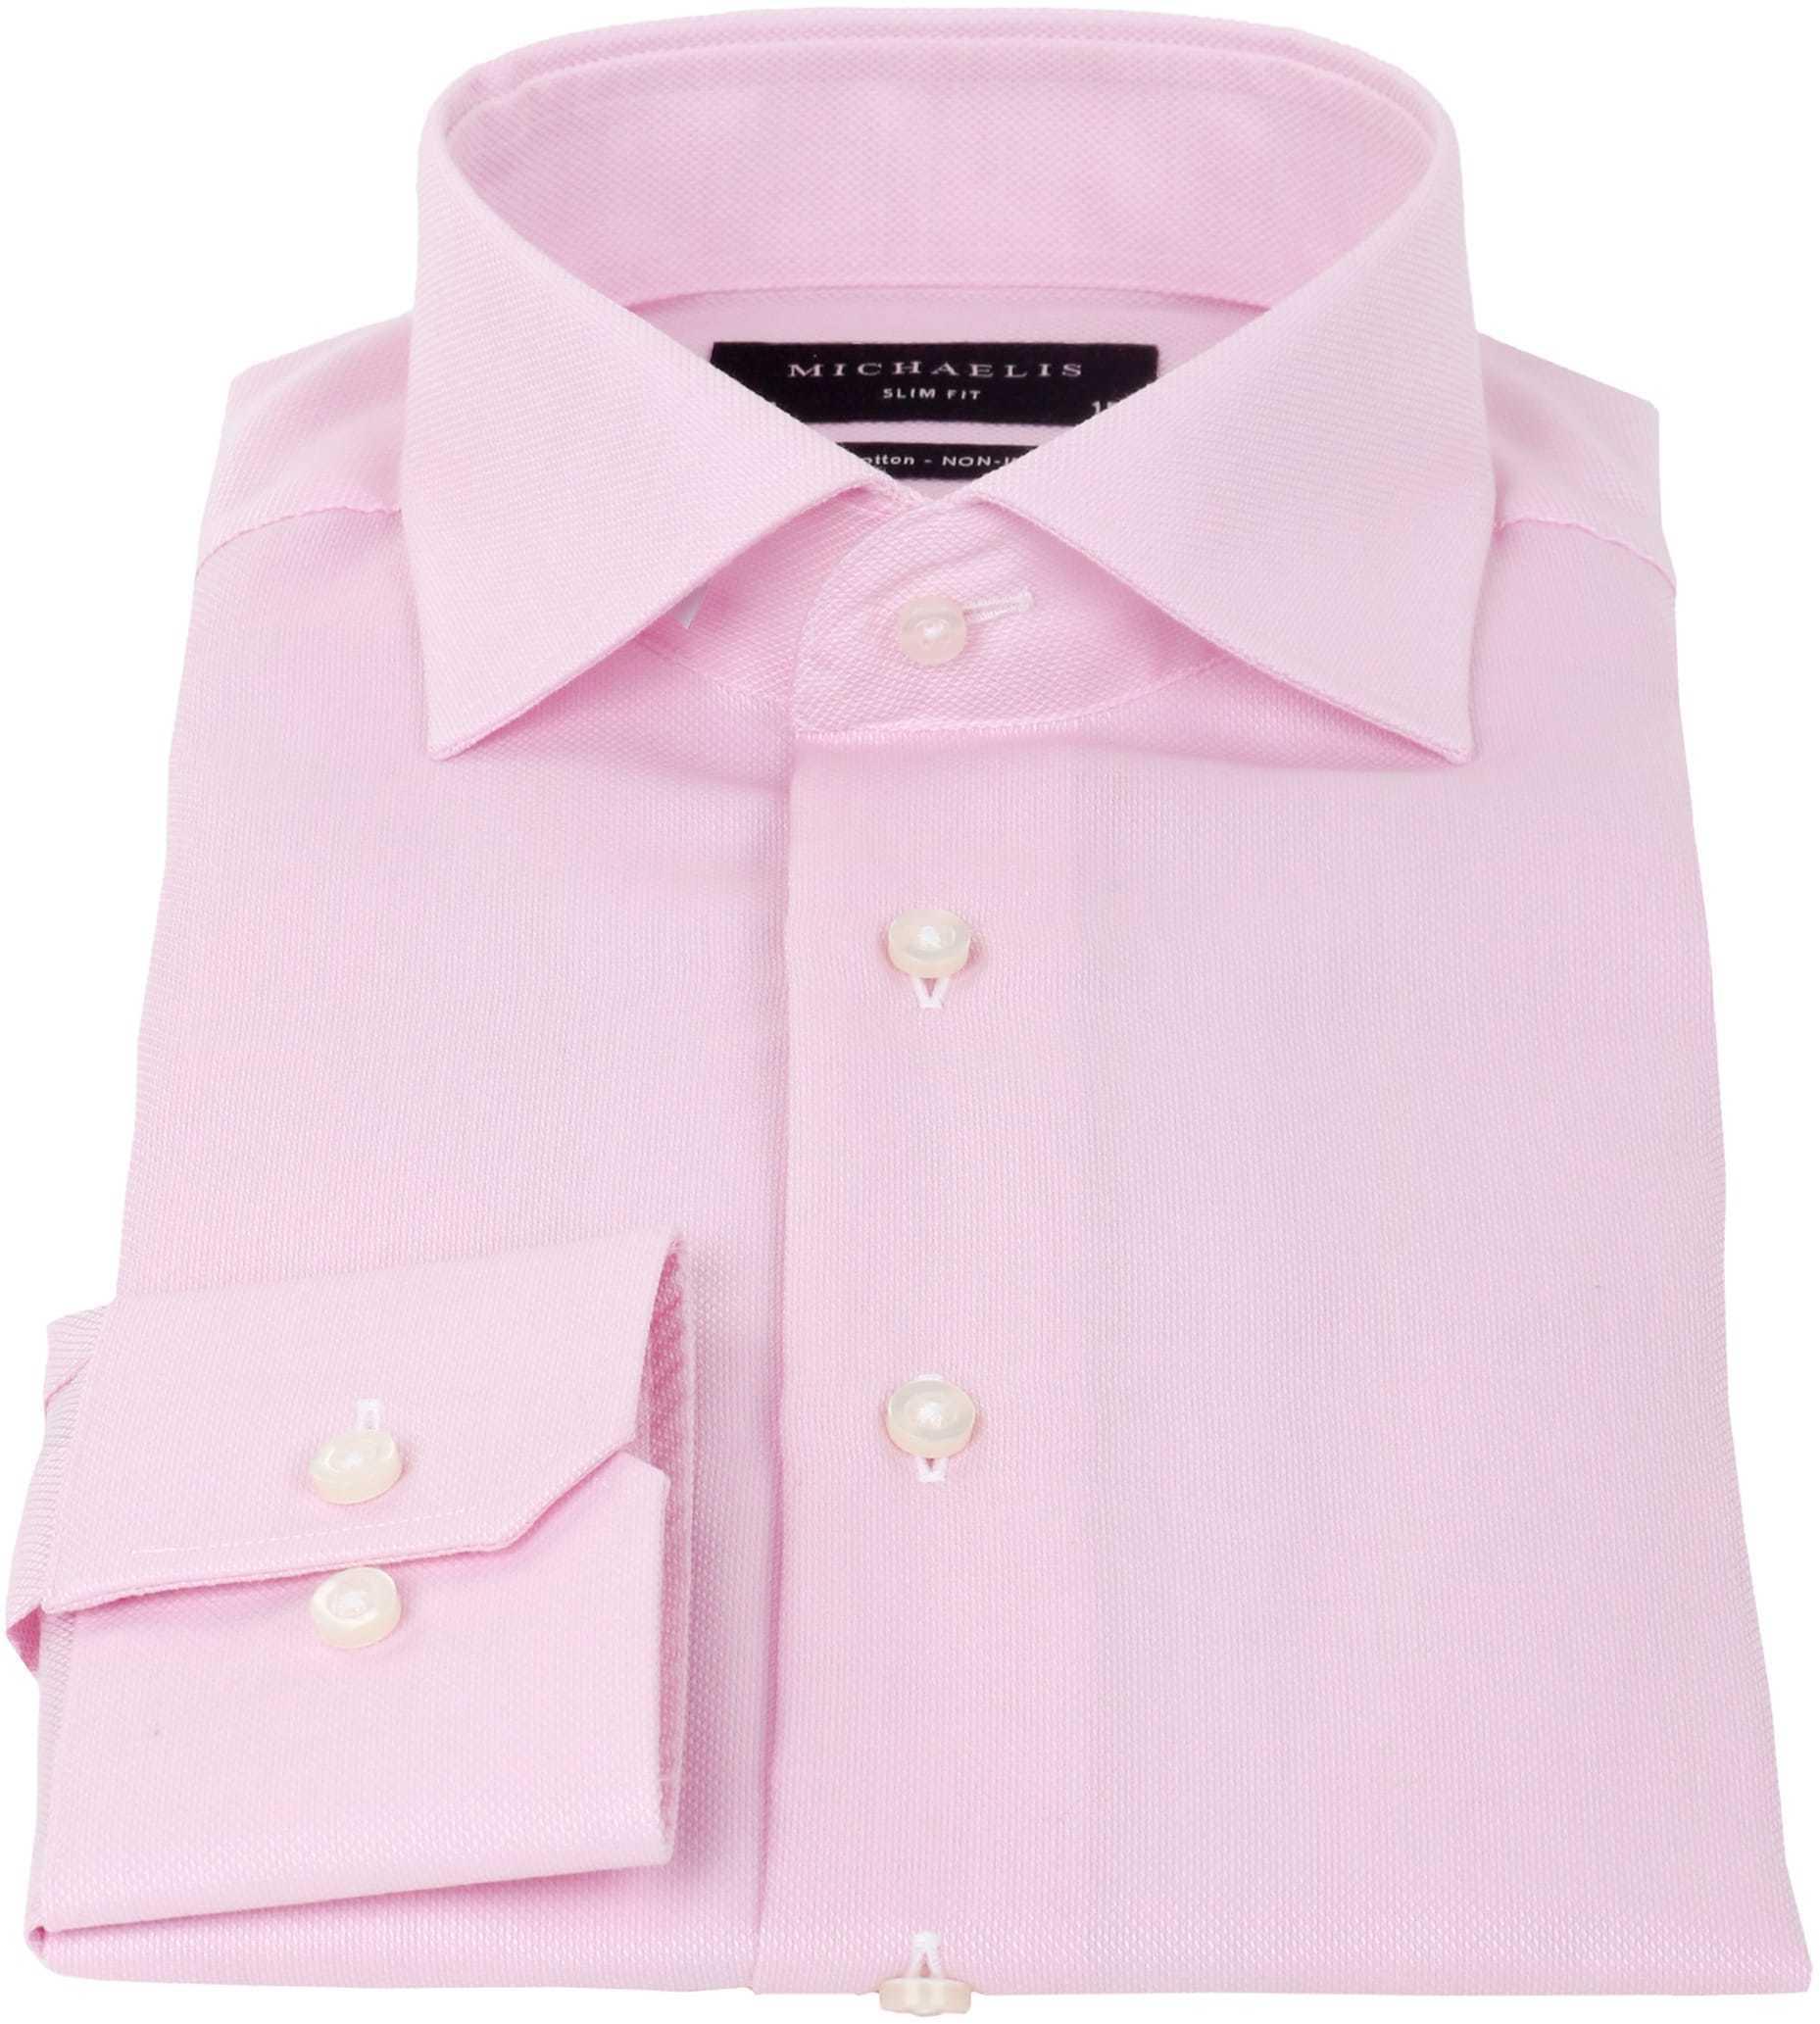 Michaelis Overhemd SlimFit Roze foto 1